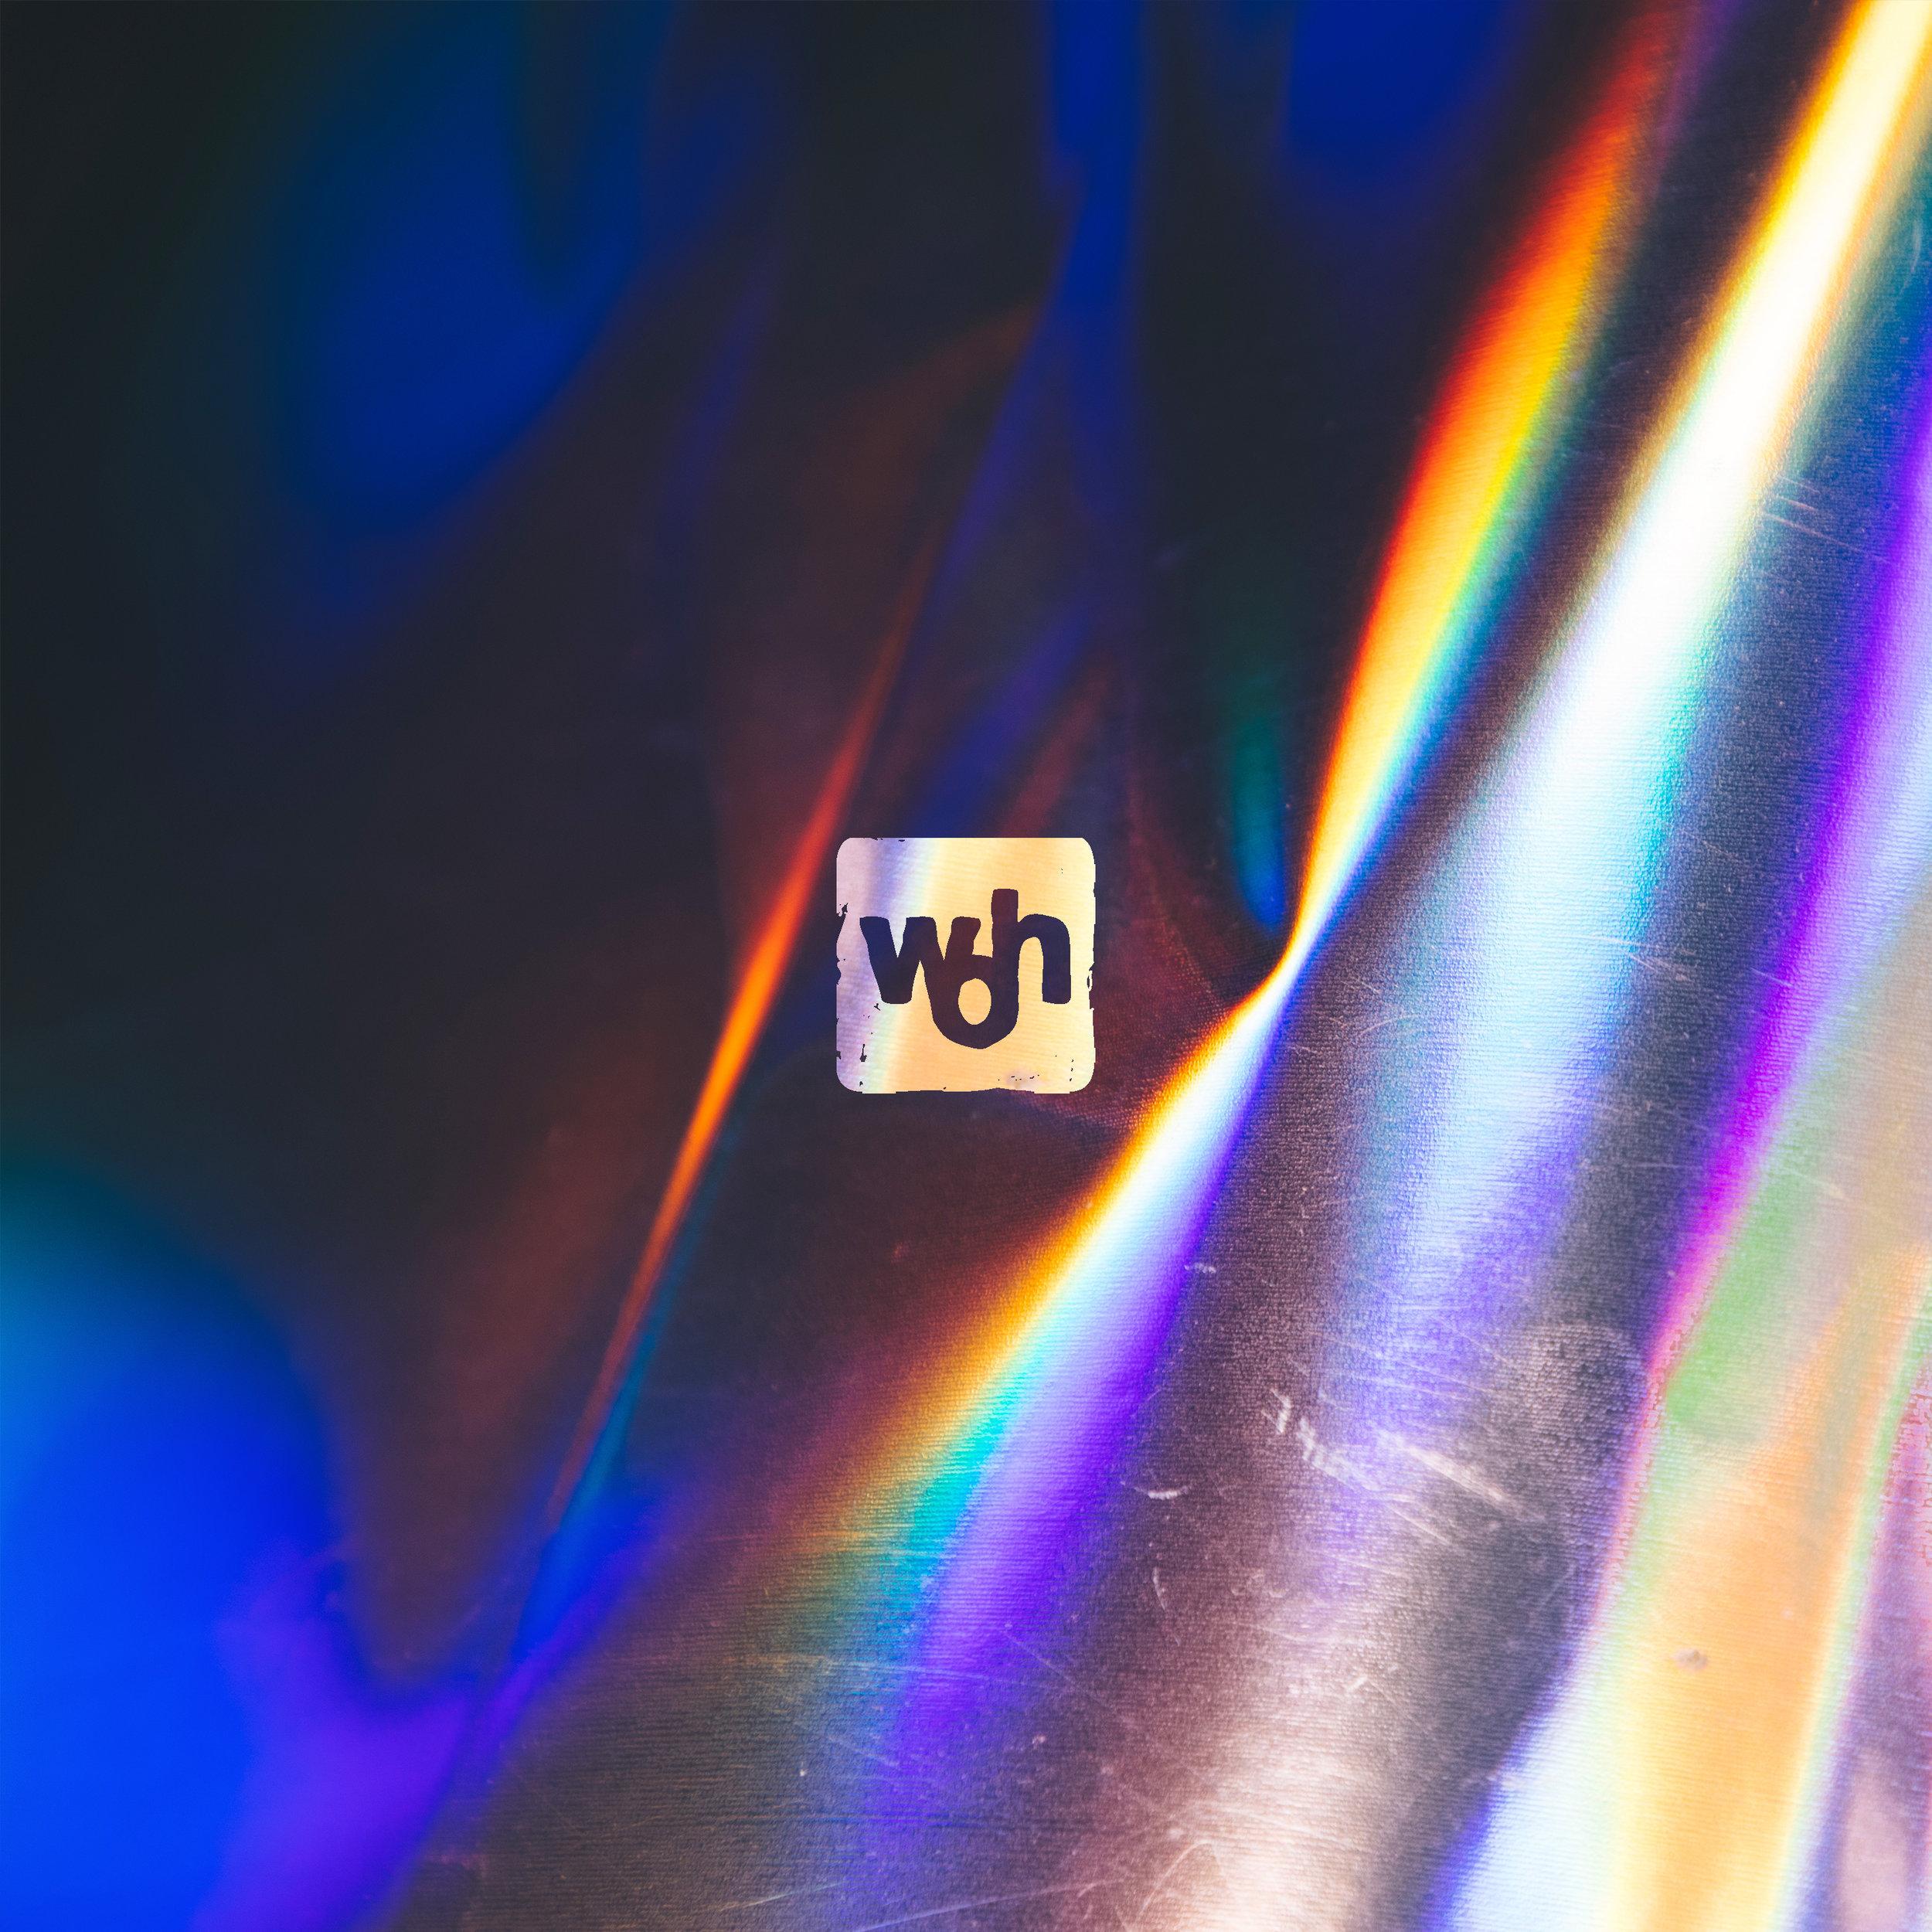 WOH-33.jpg